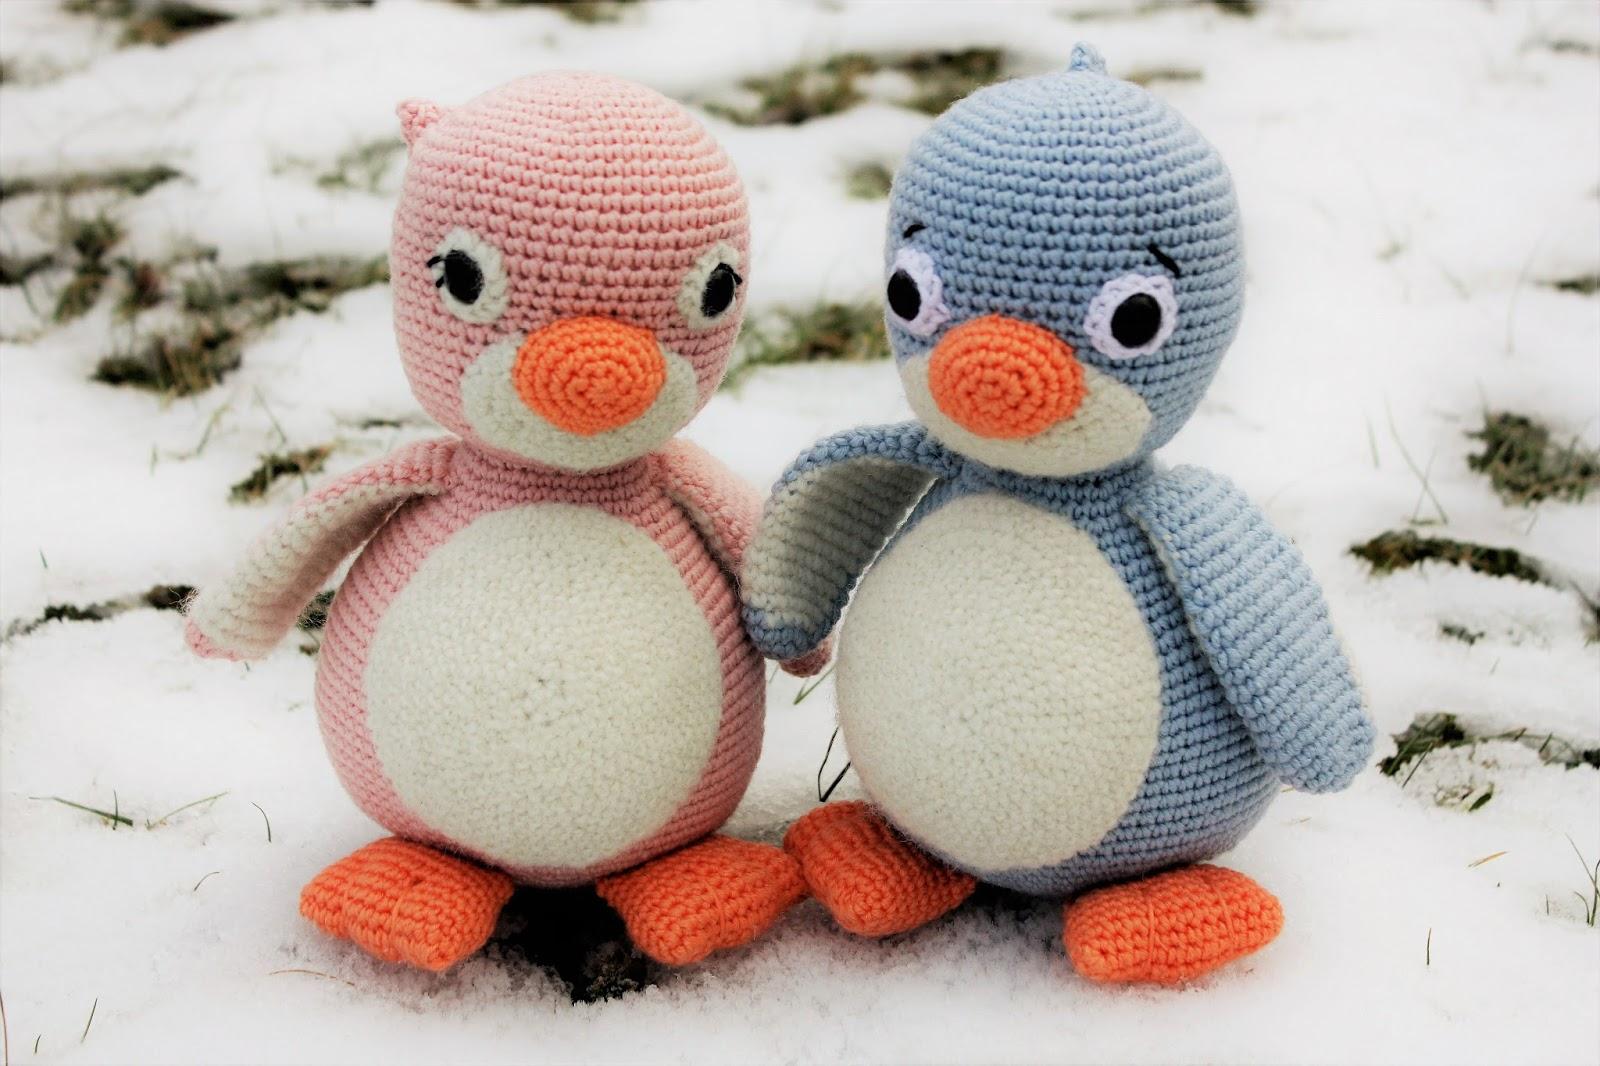 Amigurumi Girl Tutorial : Happyamigurumi: Amigurumi Crochet Penguin Pattern: Cara ...